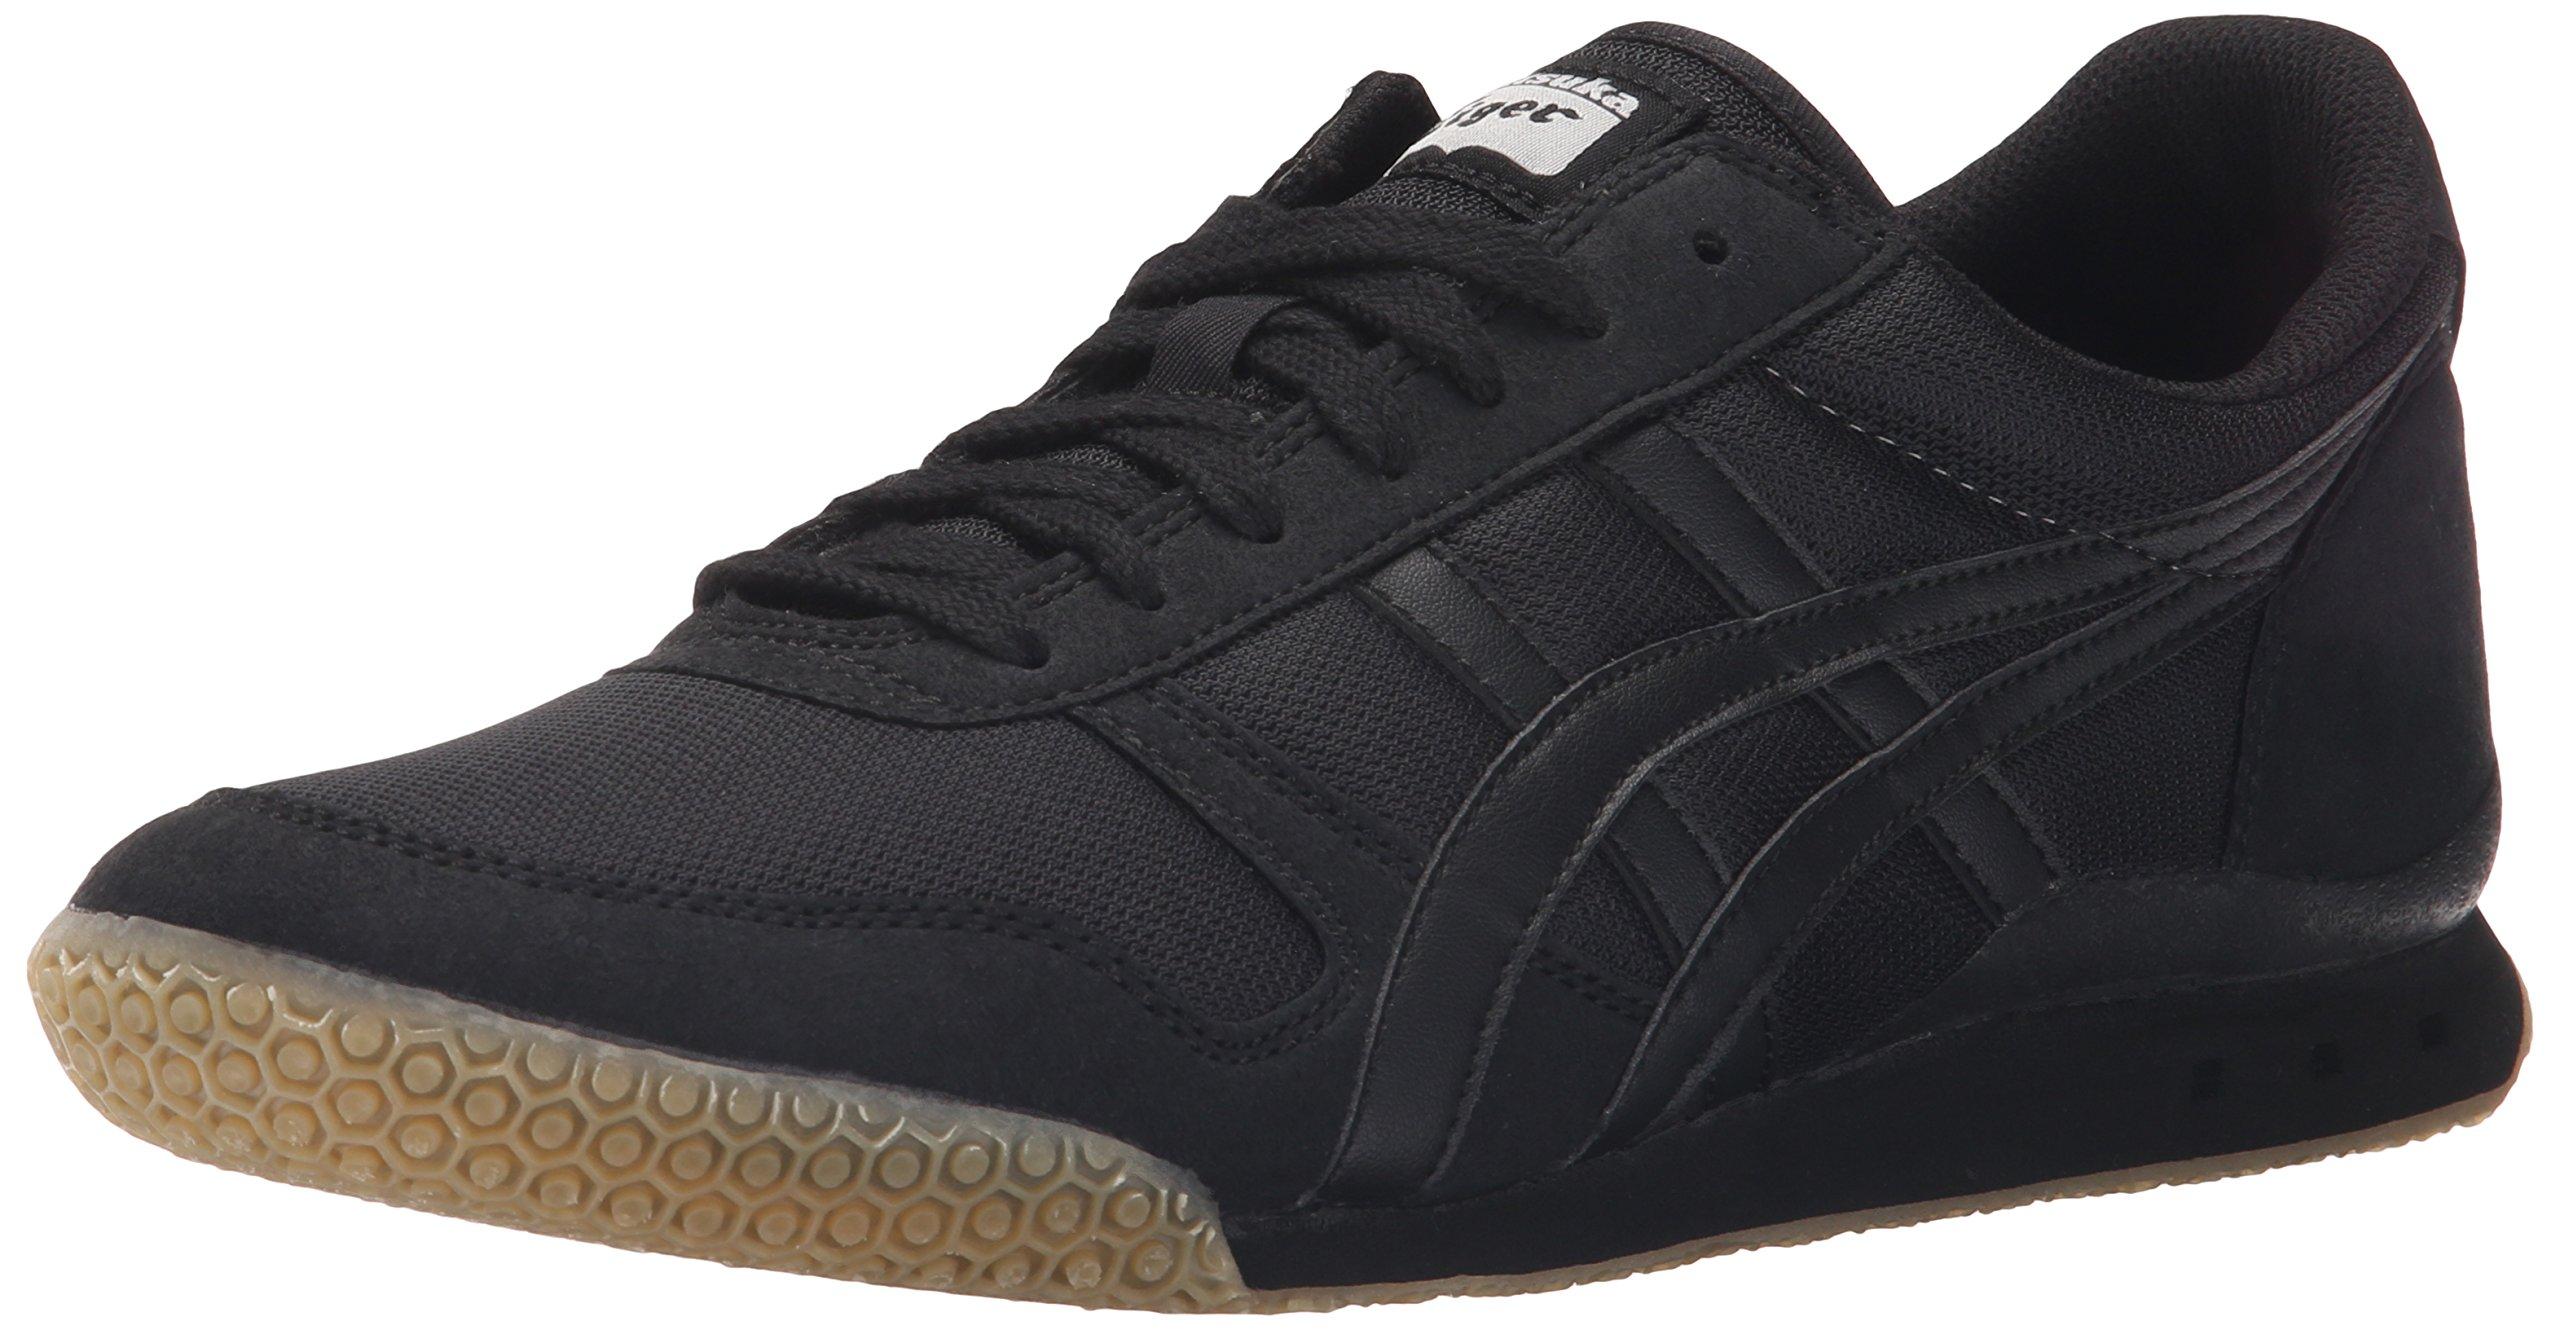 Onitsuka Tiger Men's Ultimate 81 Fashion Sneaker, Black/Black, 8.5 M US